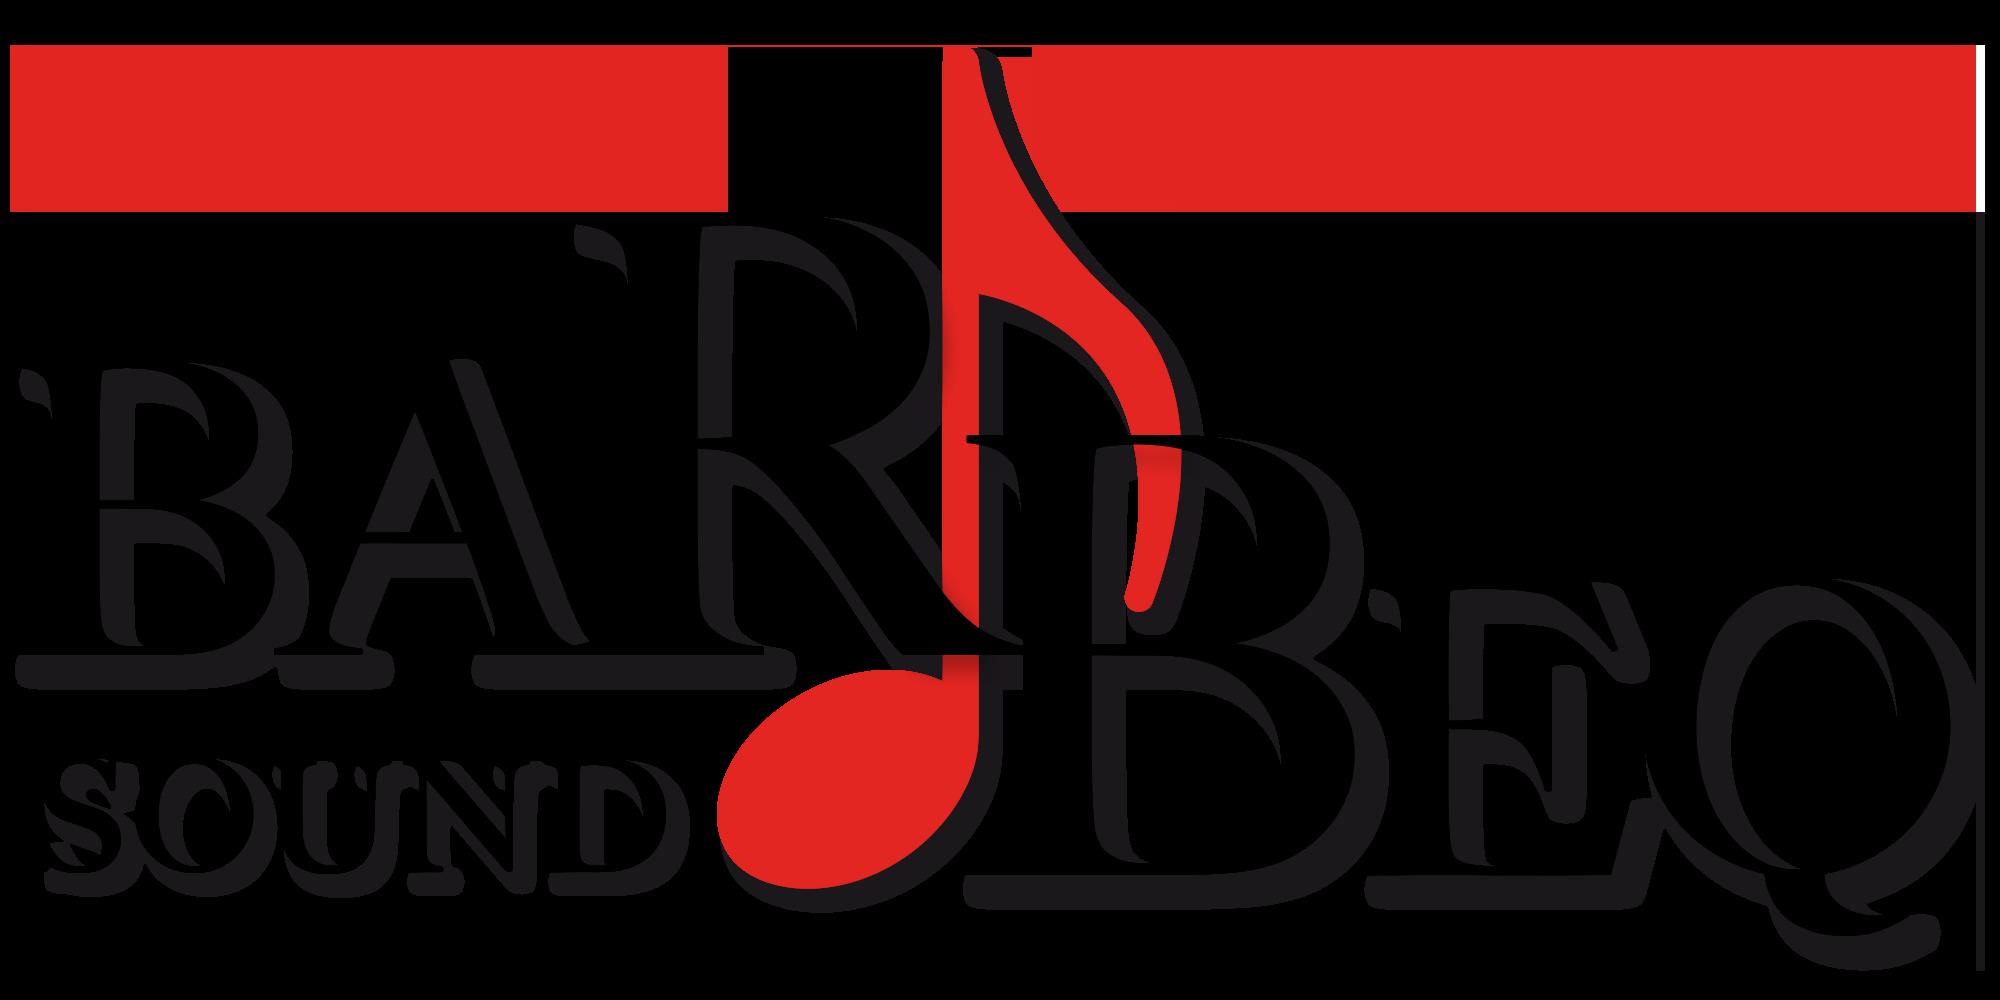 BARBEQ-Sound